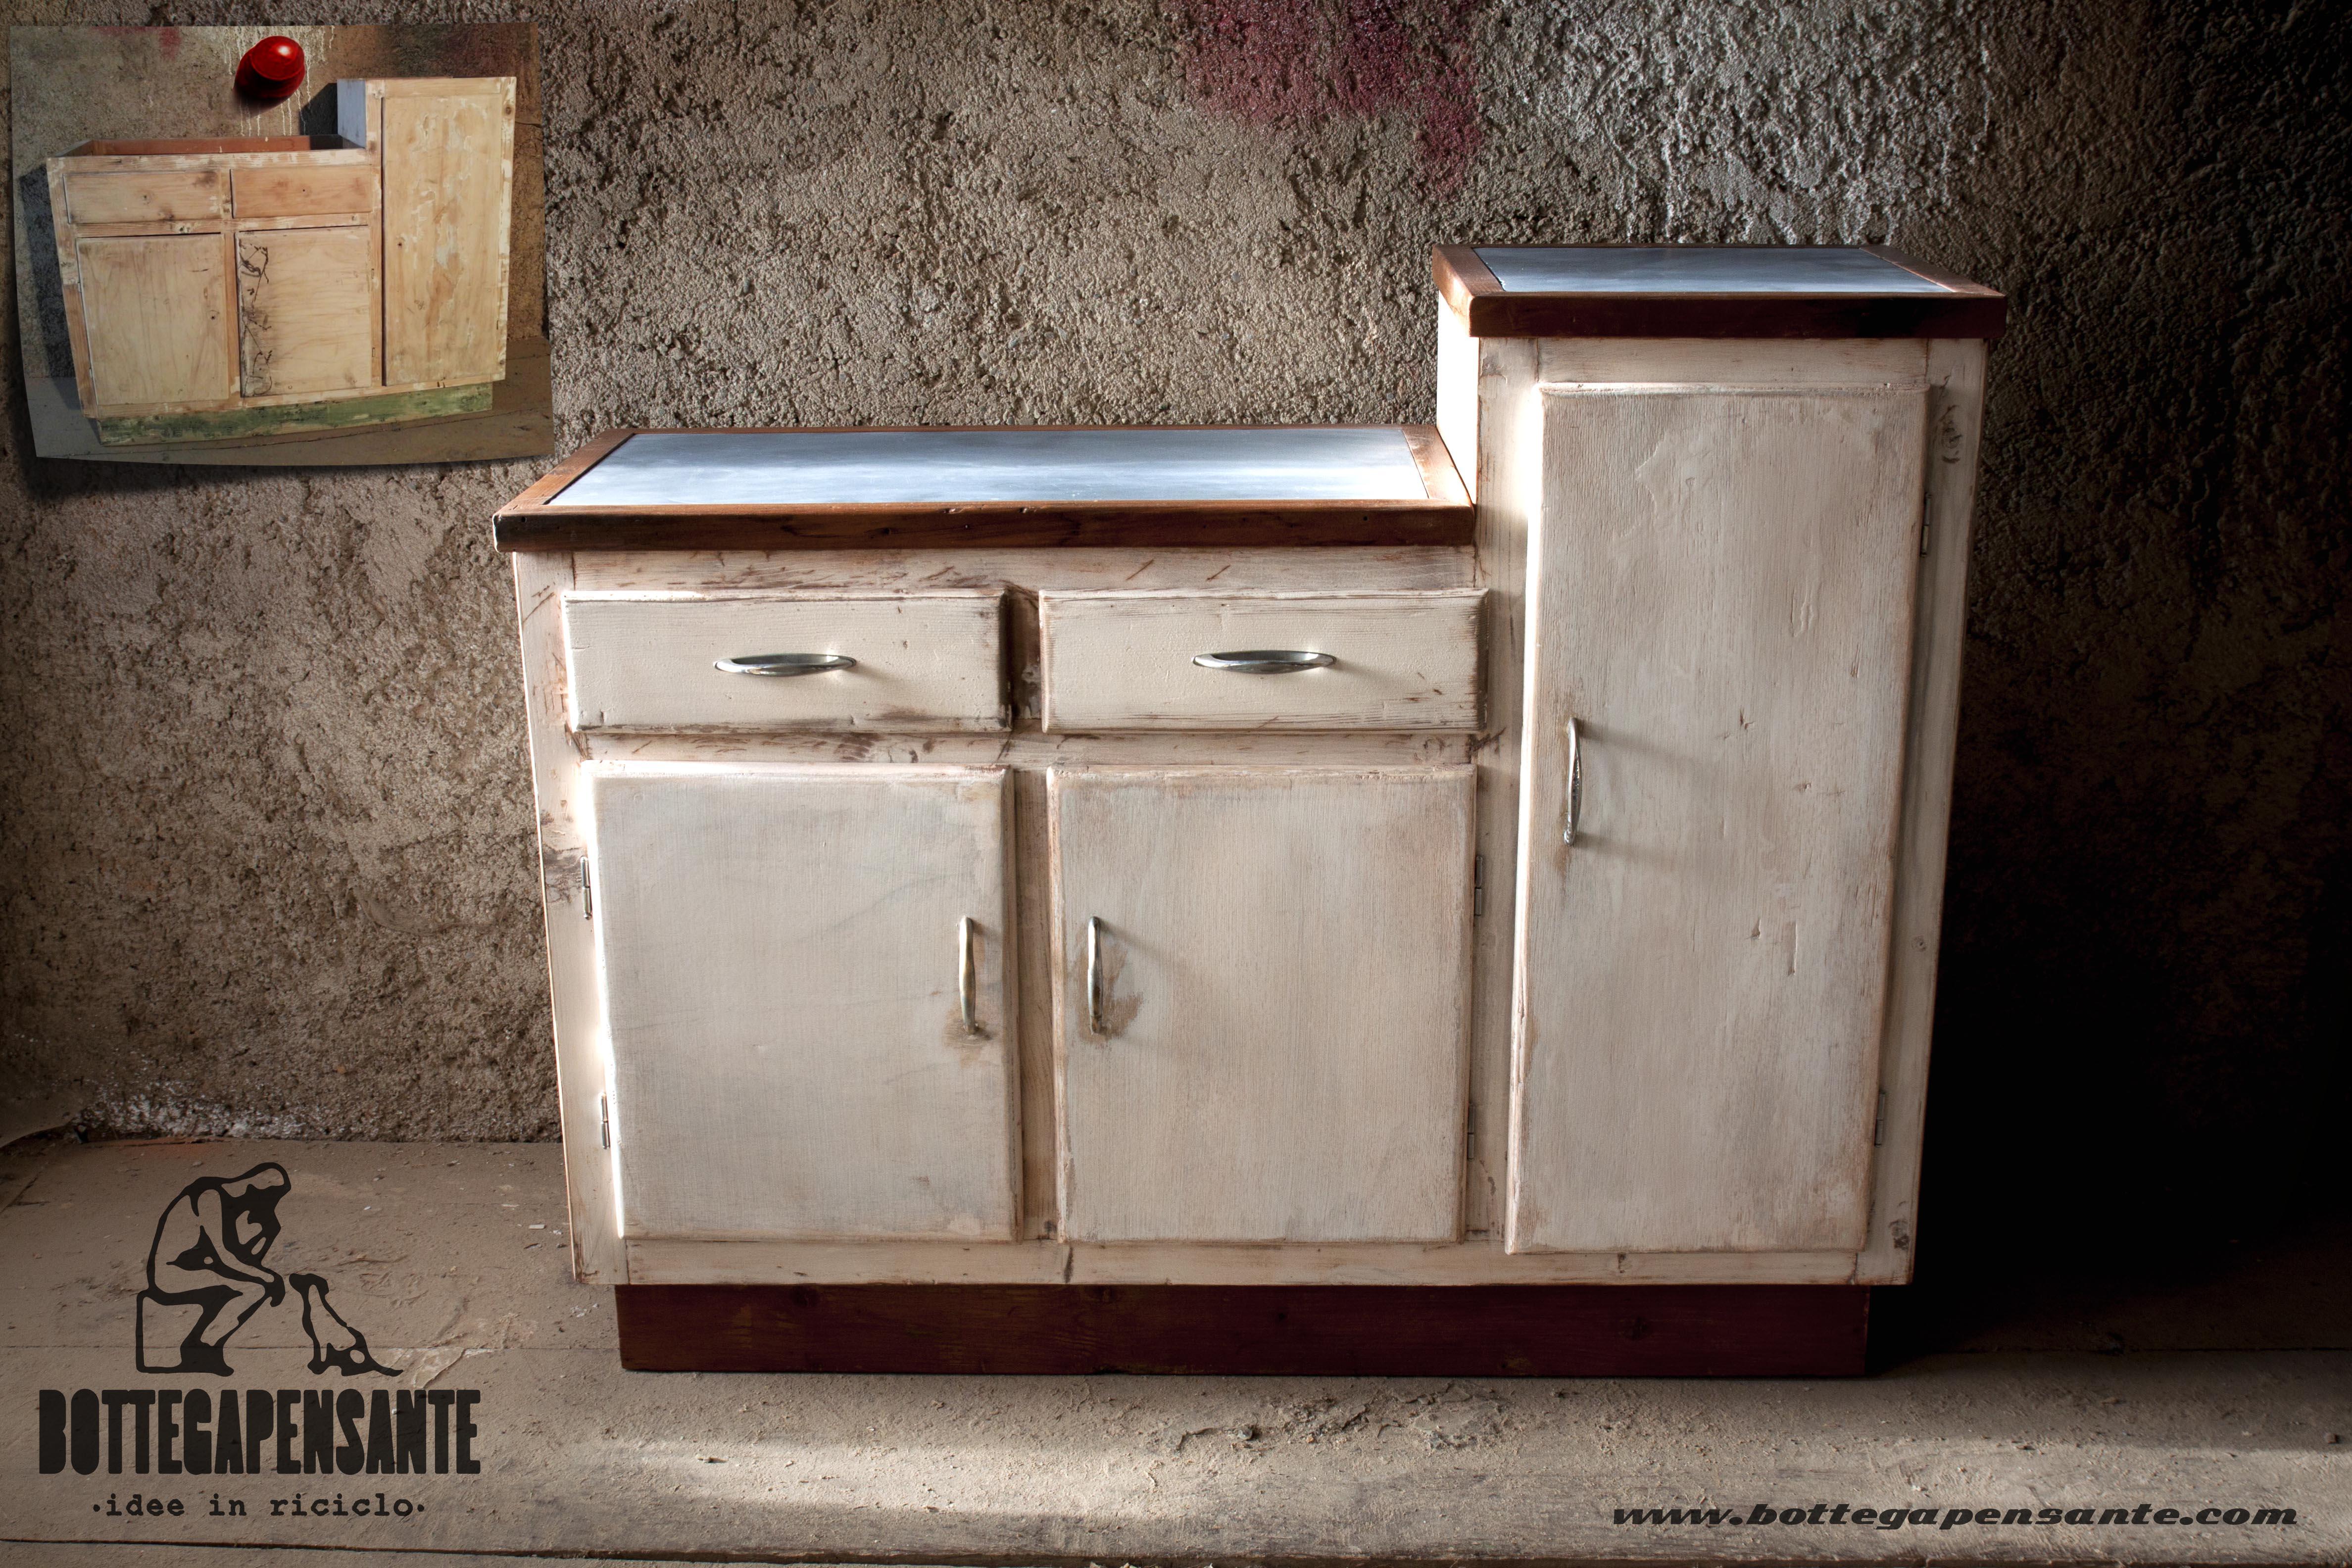 Mobile da cucina bianco riciclato vintage   bottega pensante